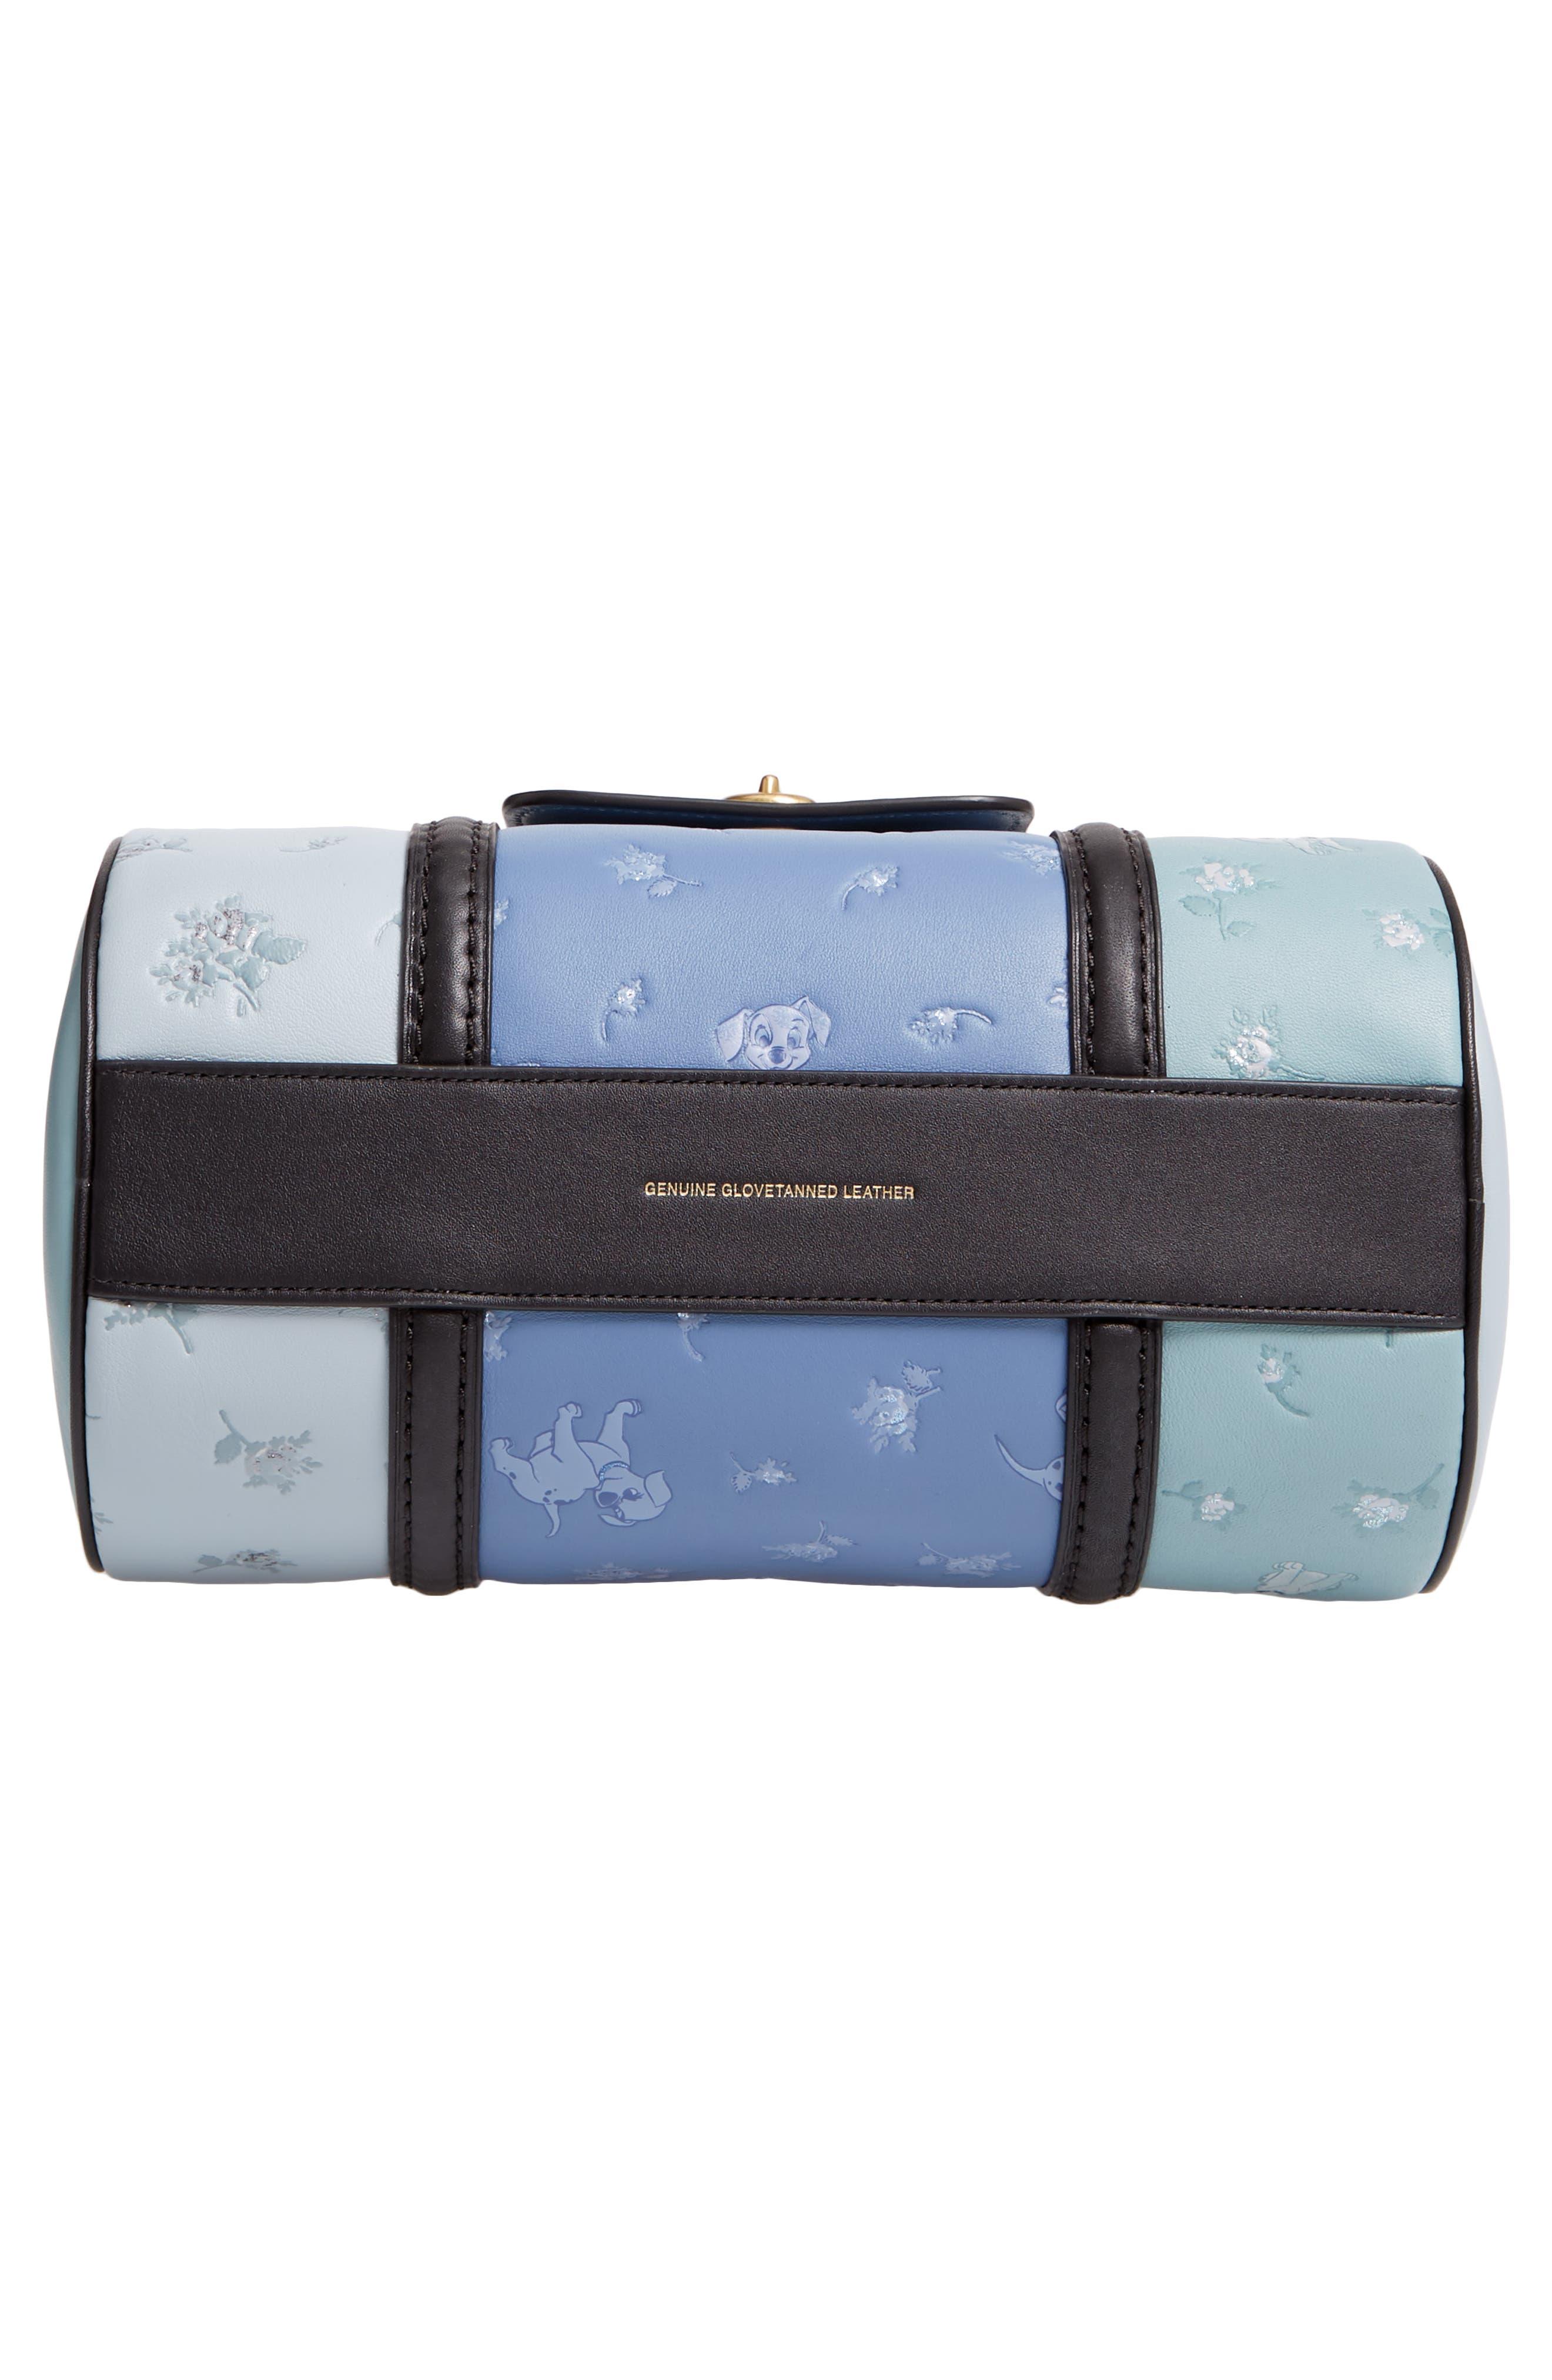 Disney x COACH 101 Dalmatians Leather Barrel Bag,                             Alternate thumbnail 6, color,                             402